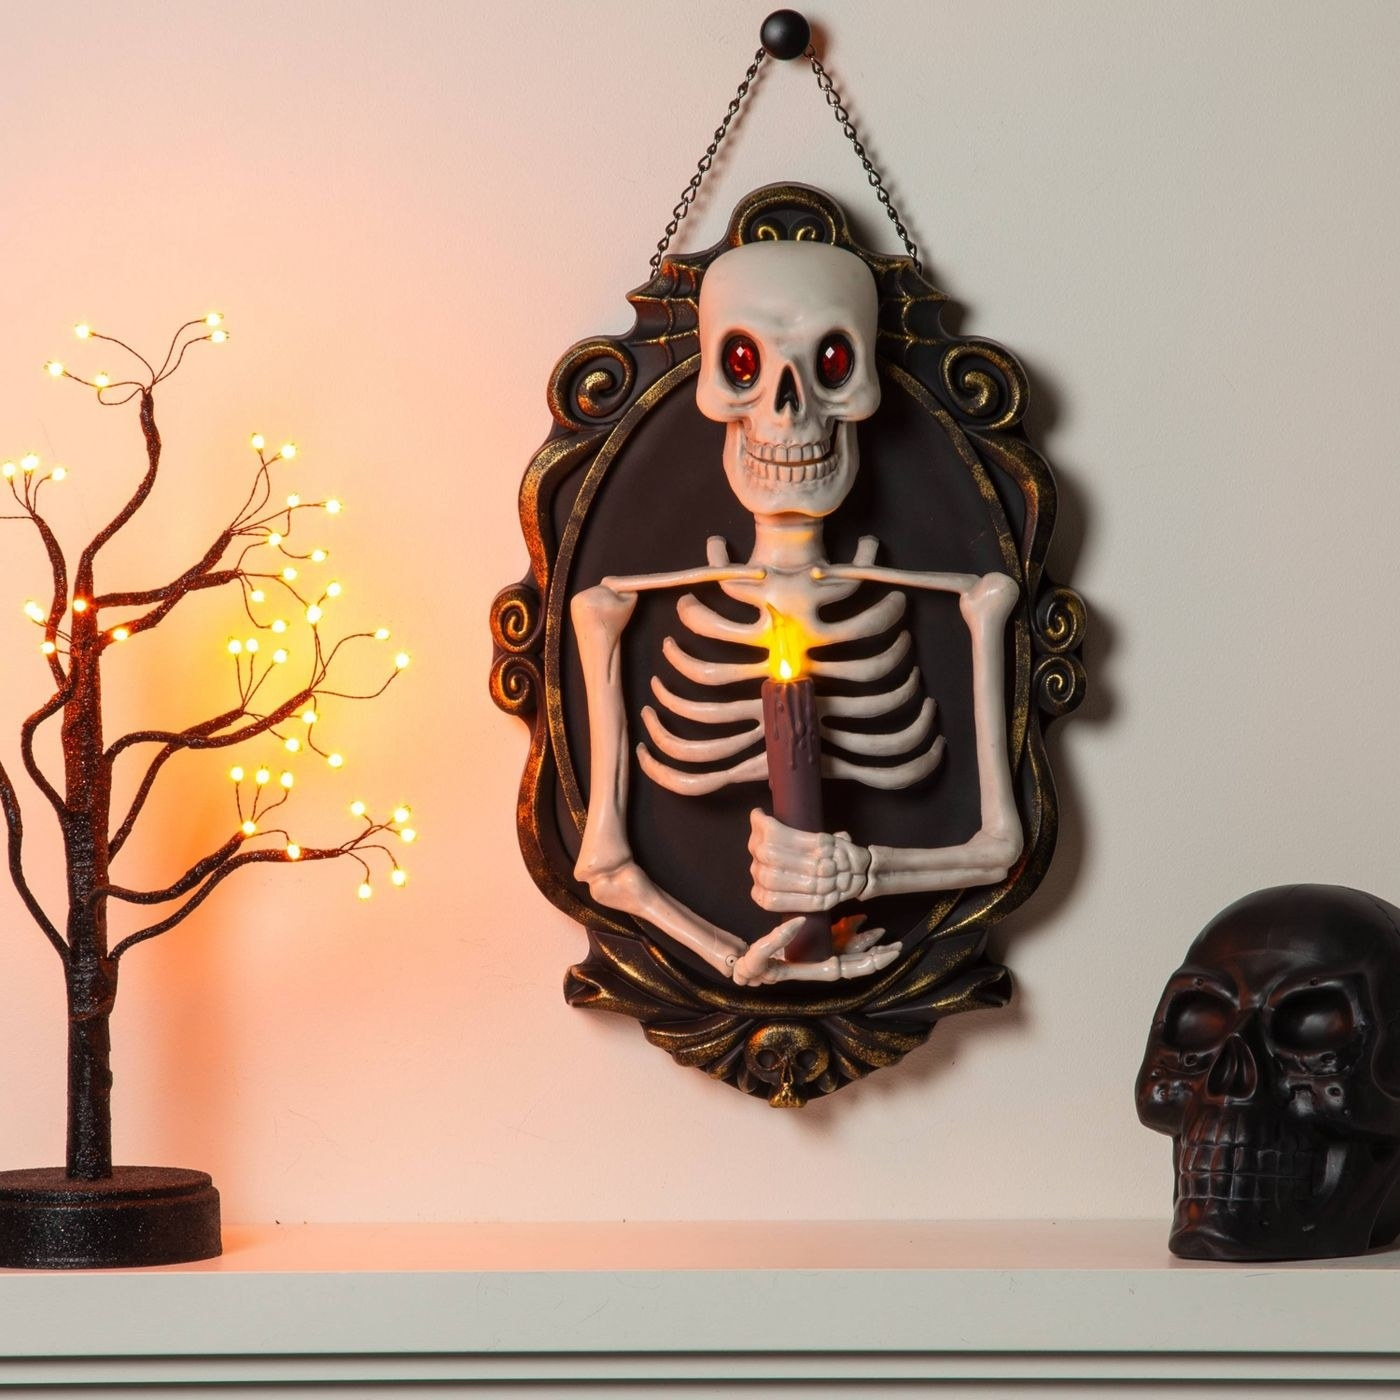 An animated skeleton